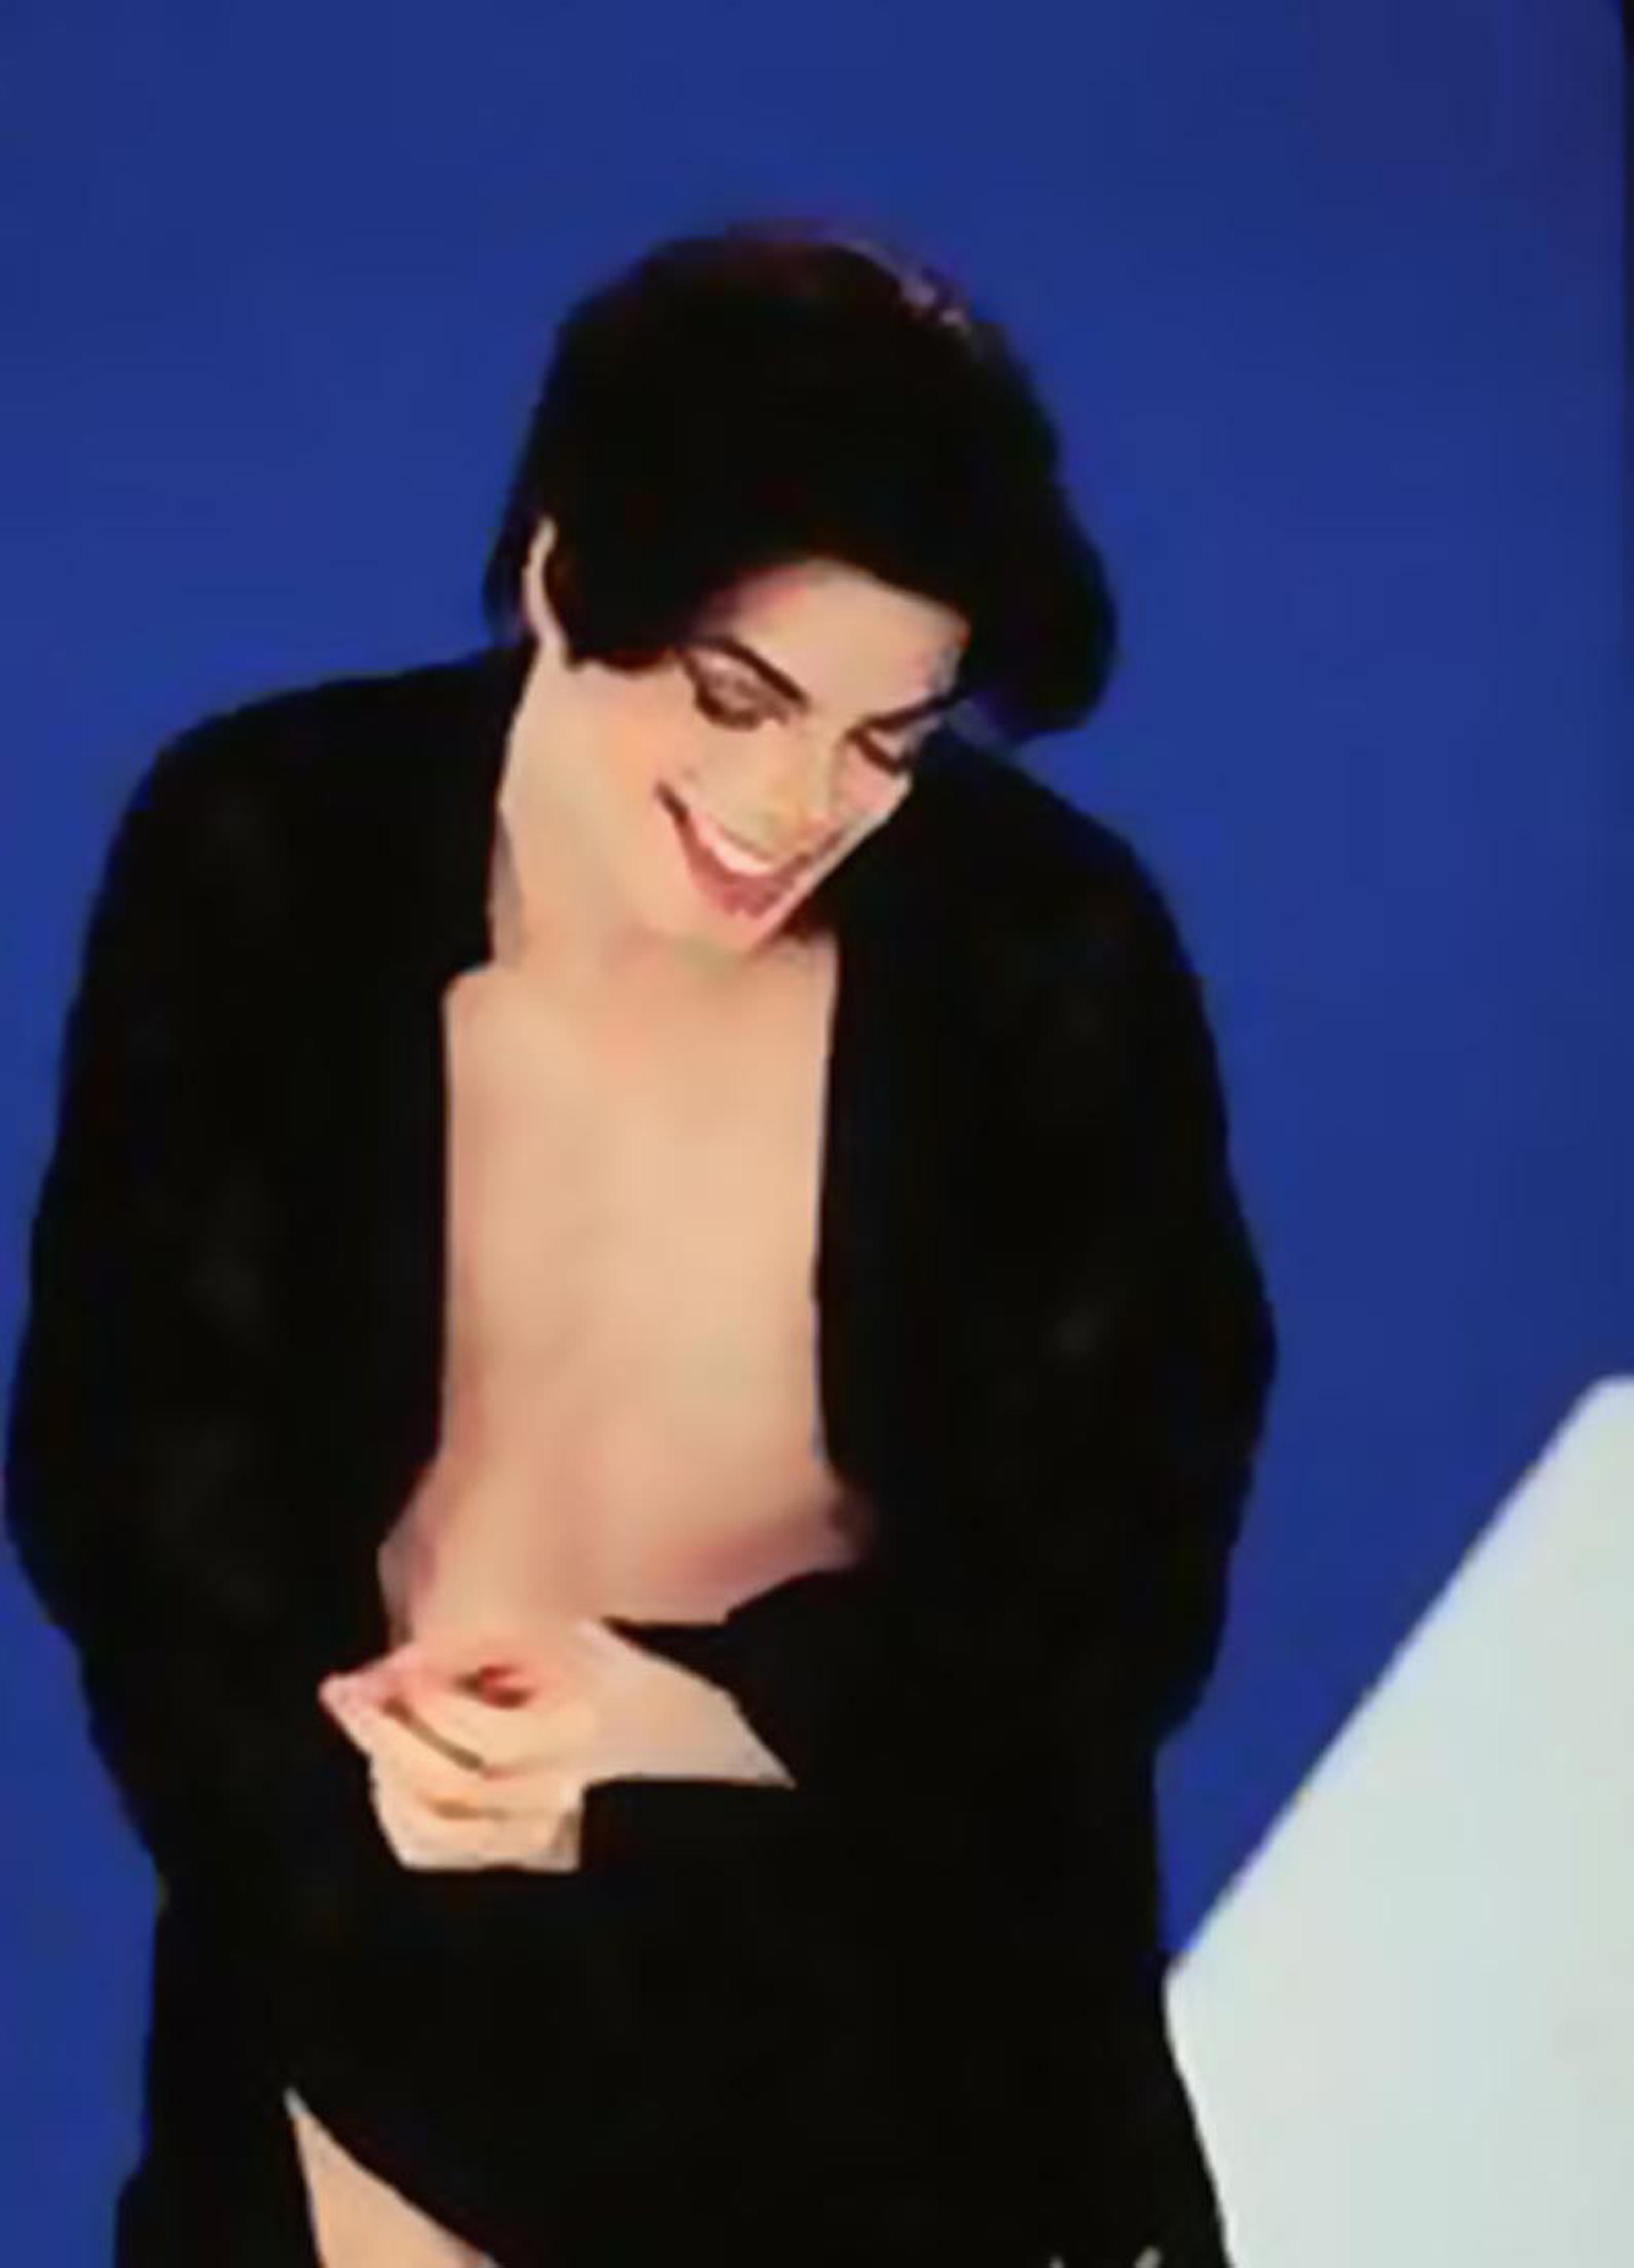 Michael jackson sexy